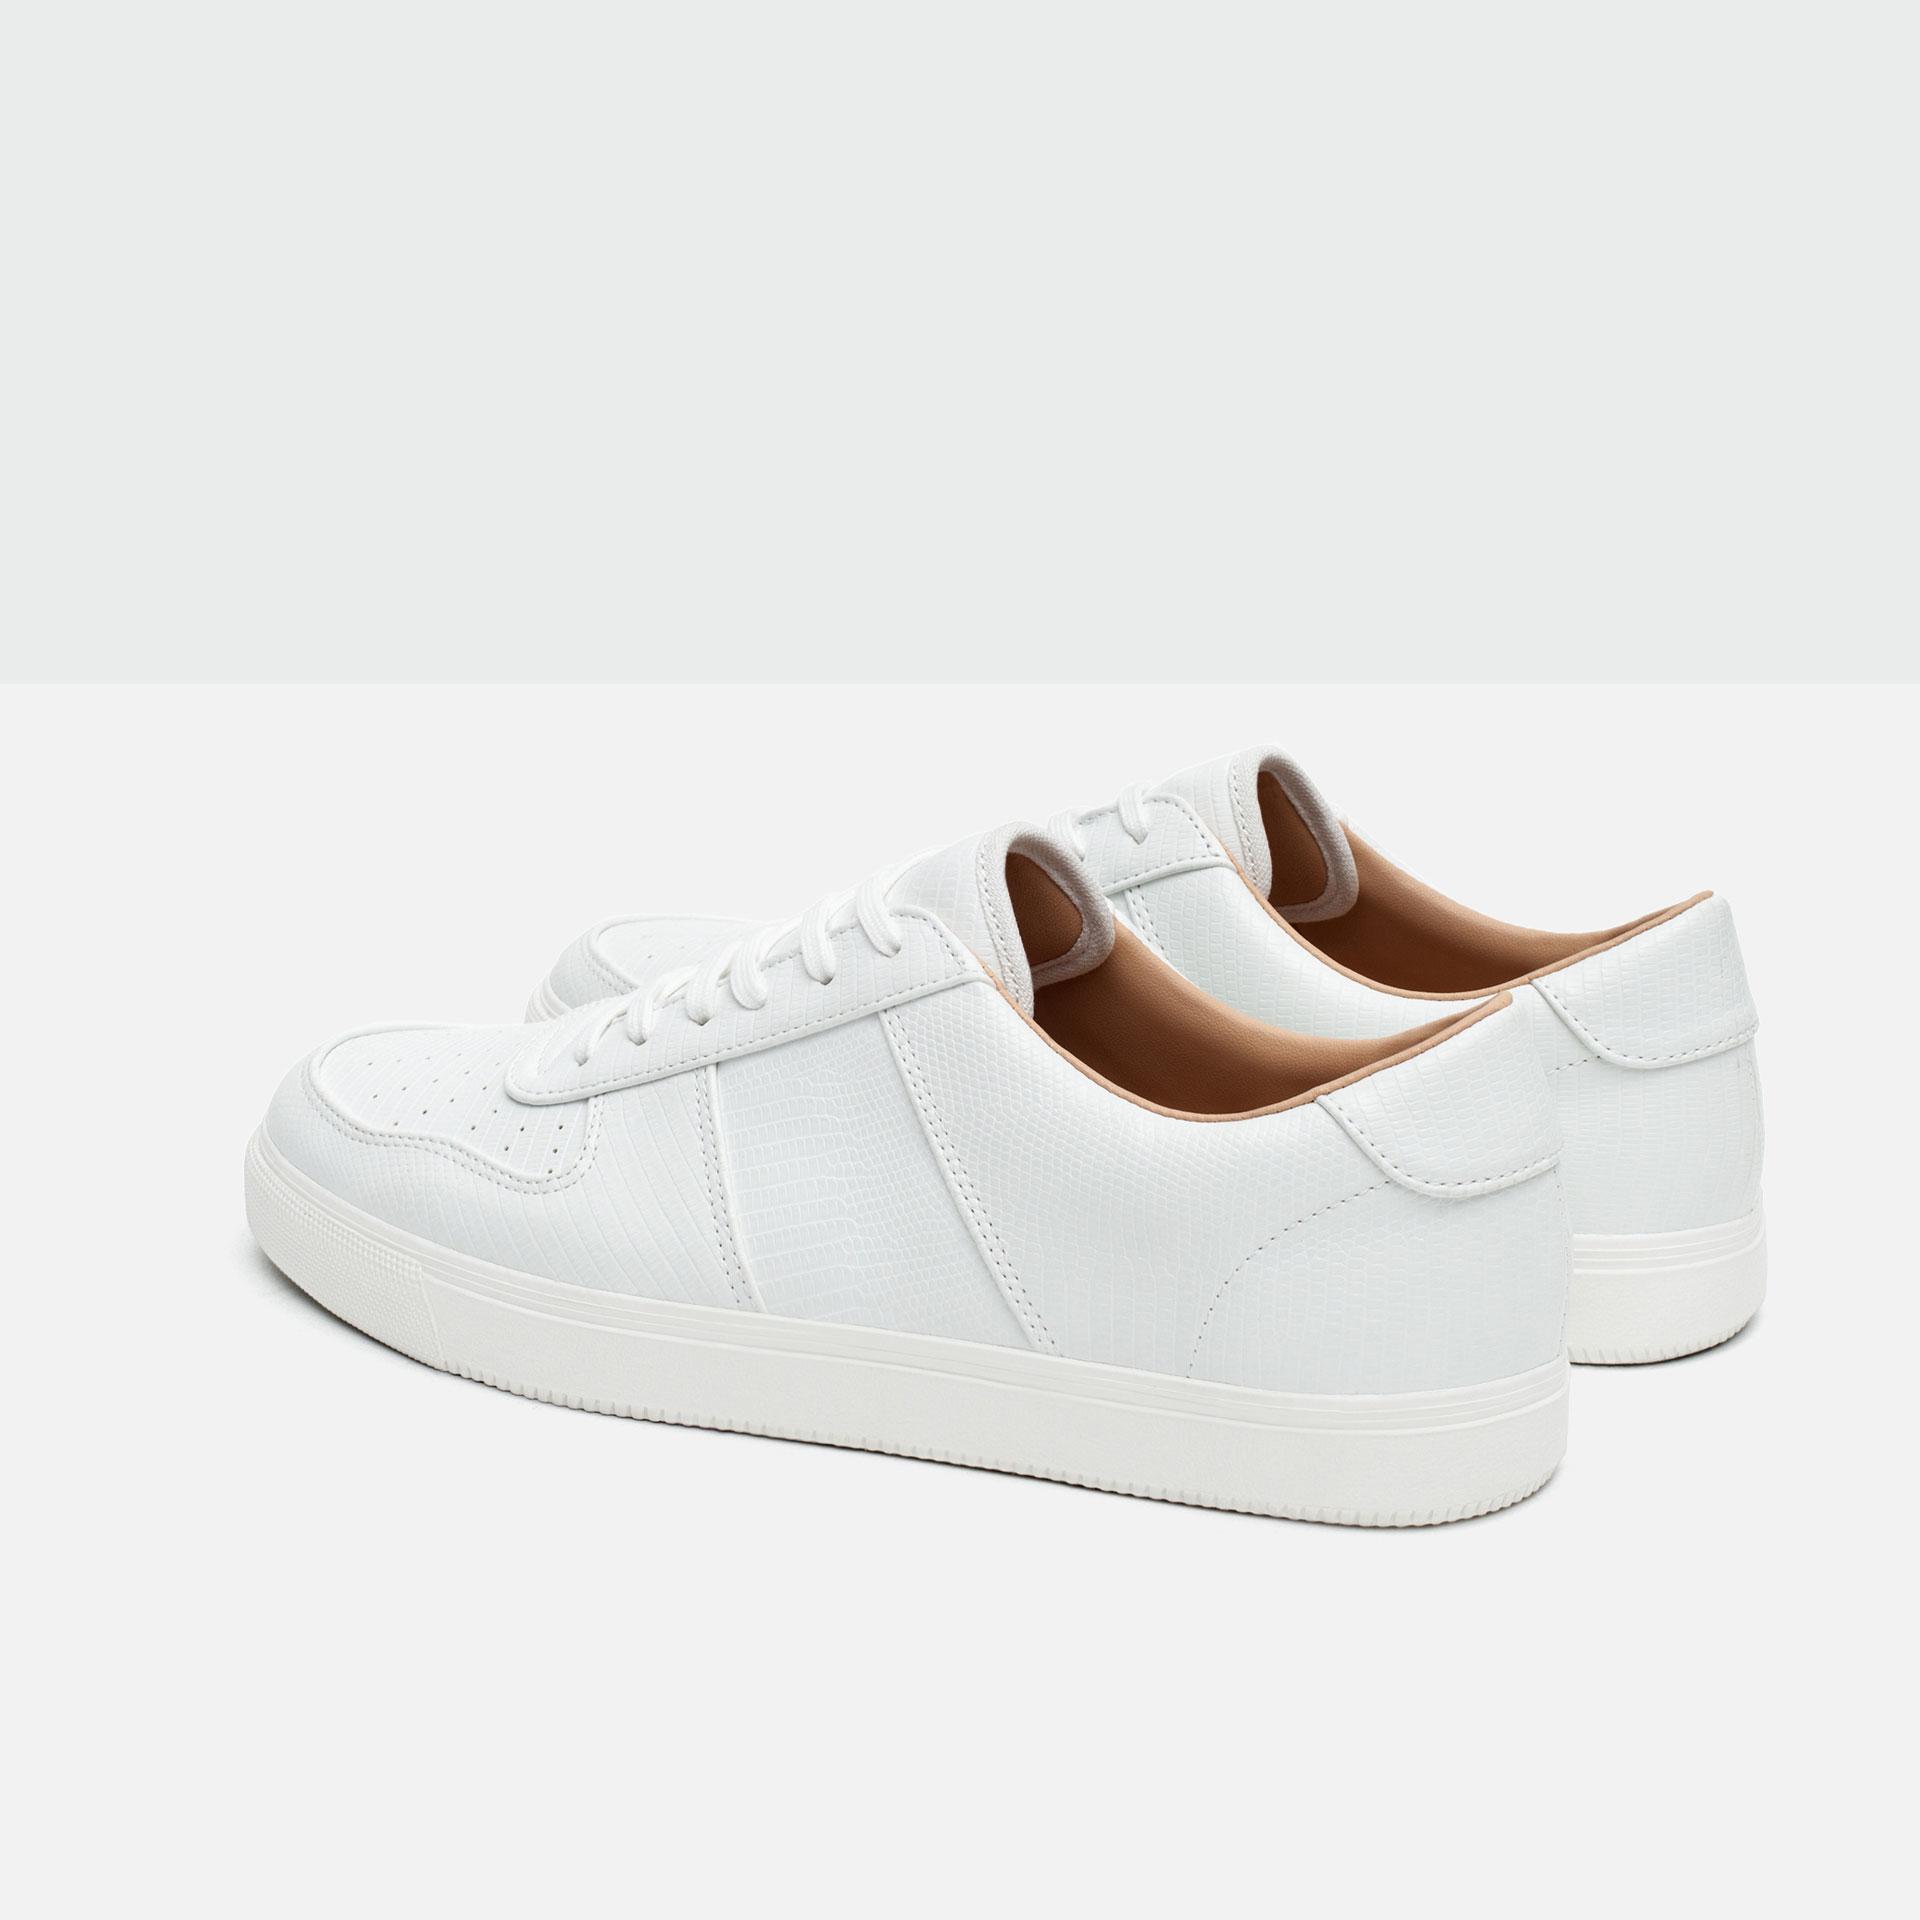 Zara Brogue Detail Sneakers In White For Men Lyst